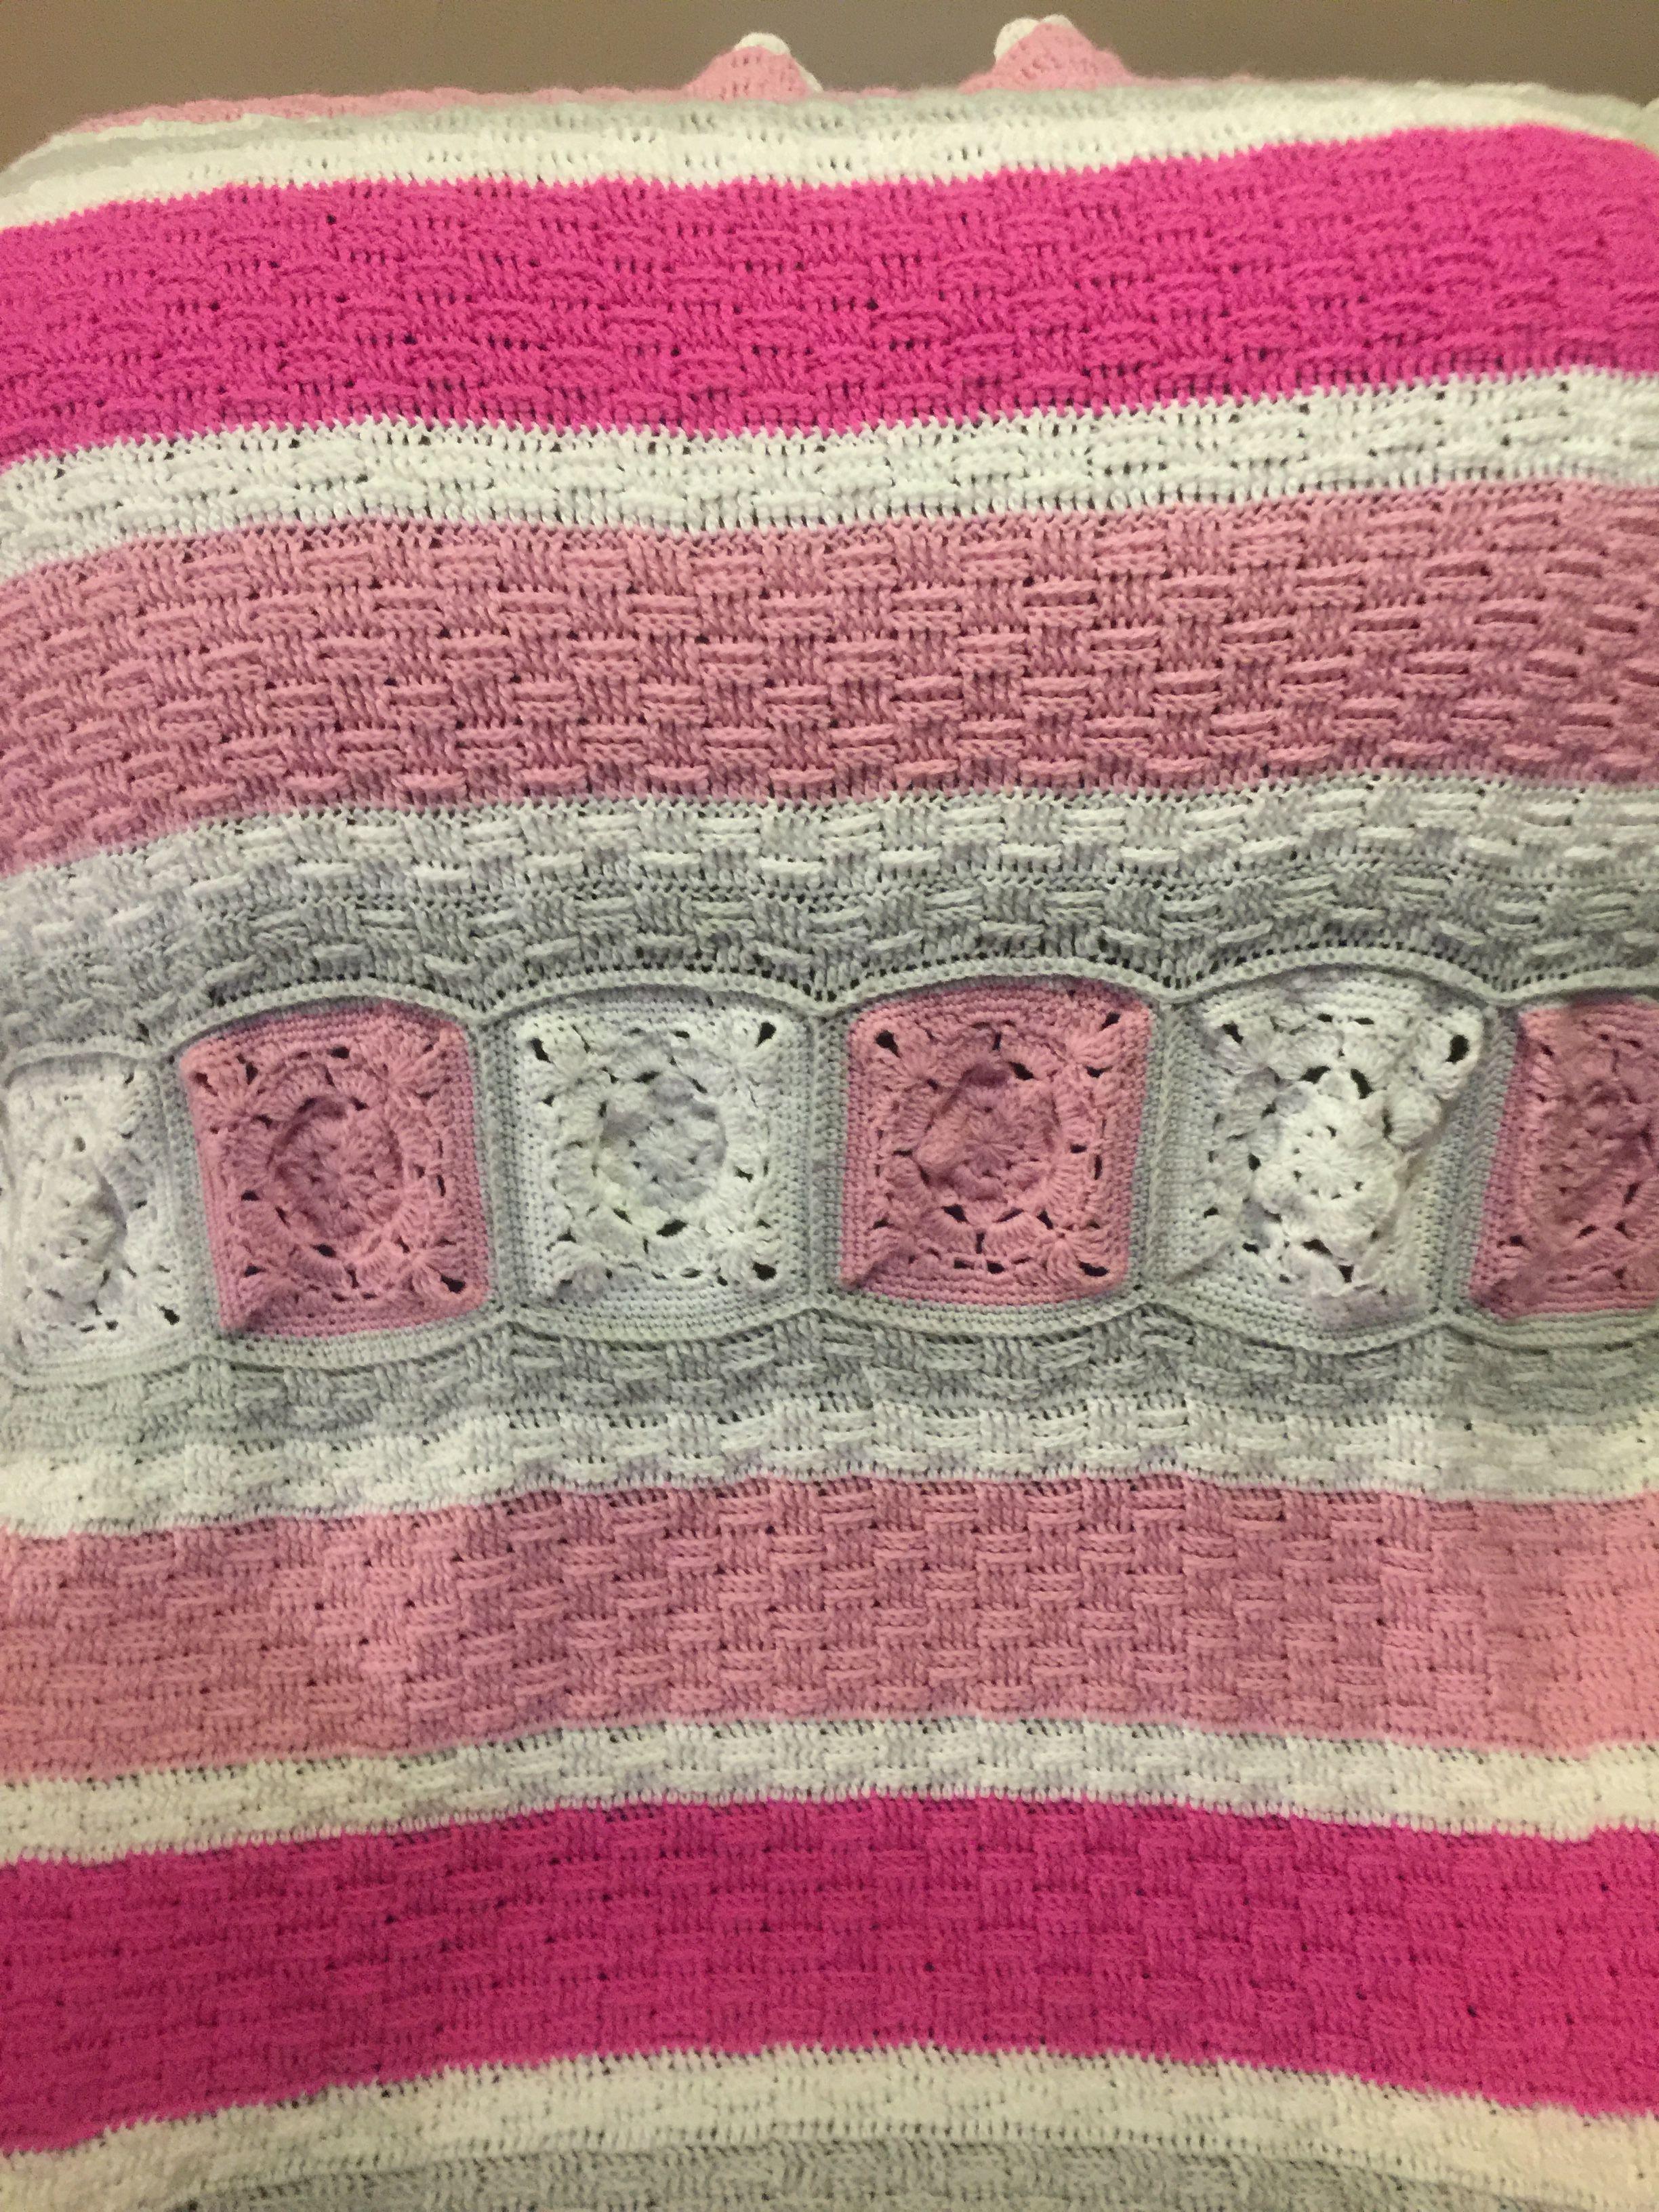 Magnolia Flower On Basket Weave Baby Blanket Crotchet Blanket Blanket Basket Weaving